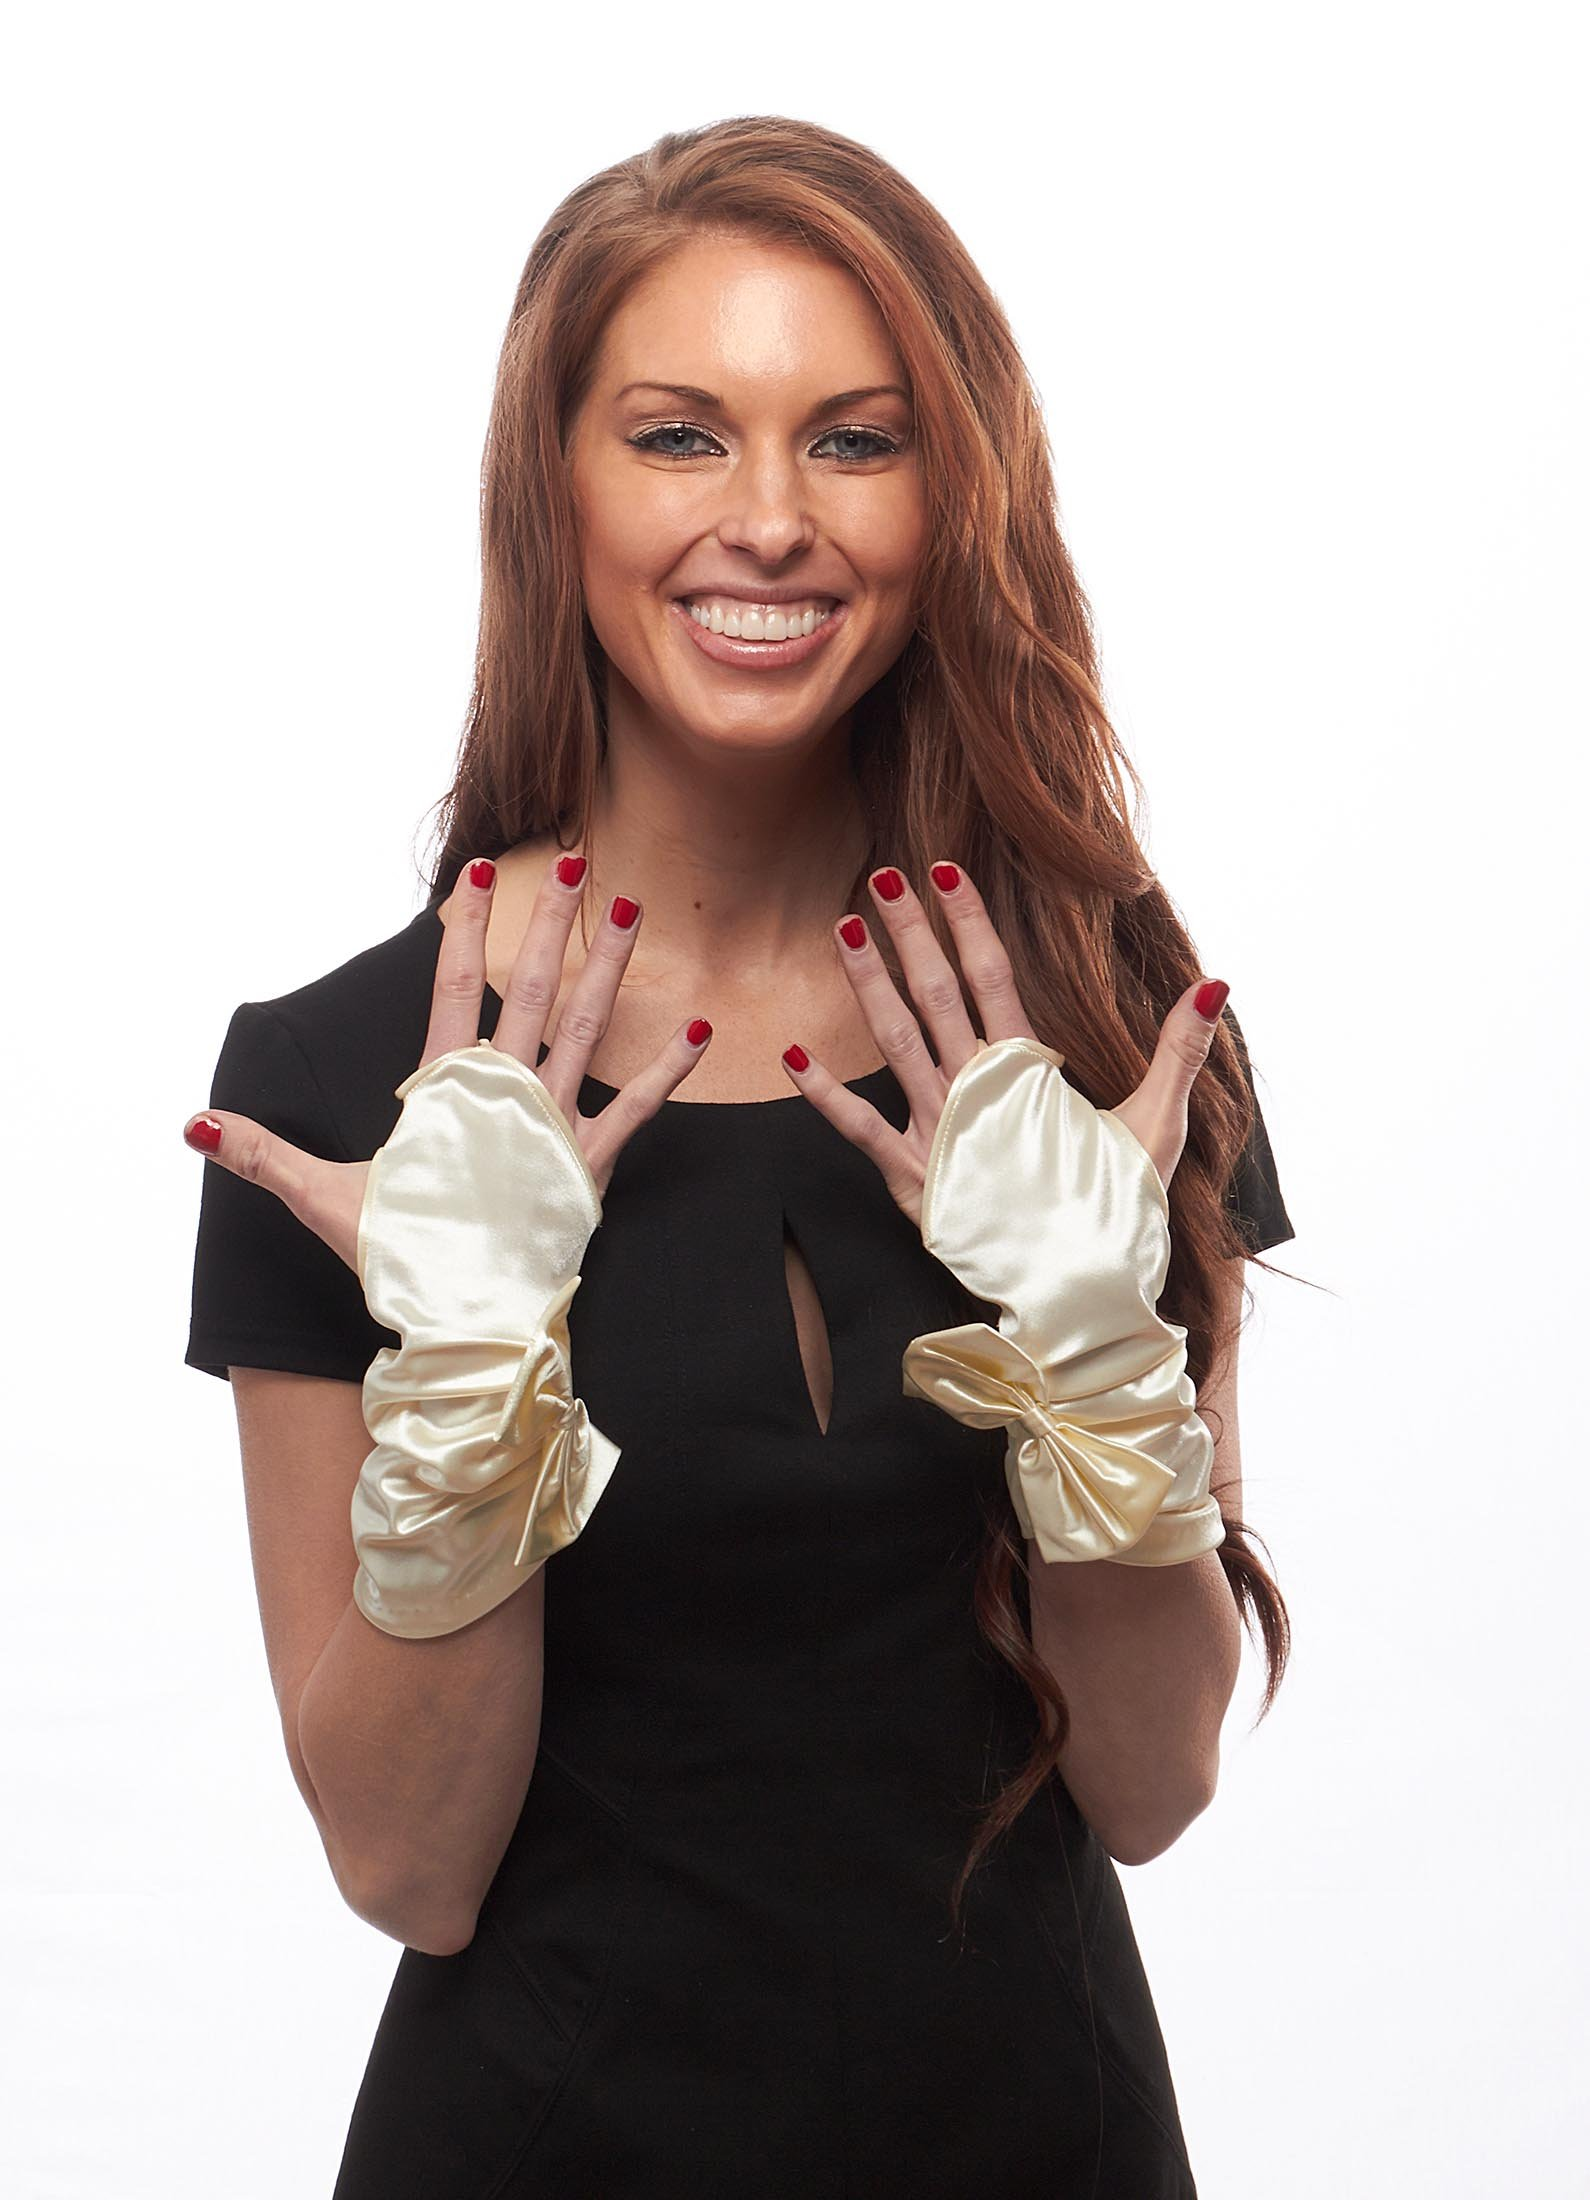 Sealed with a Bow Shiny Satin Fingerless Wrist Length Gloves (Ivory)